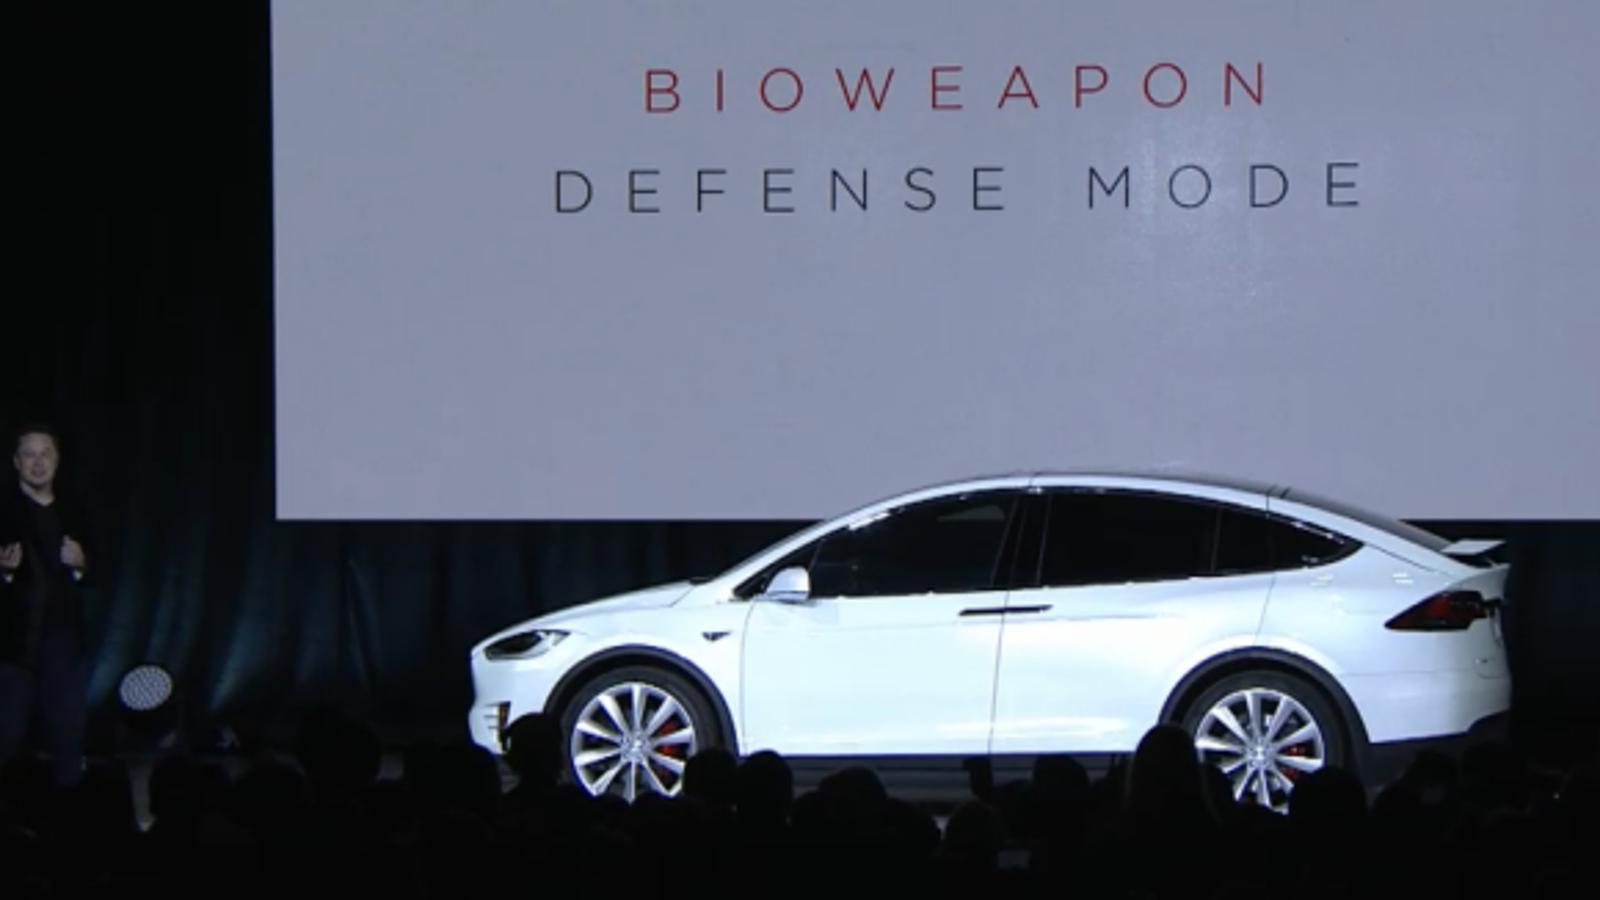 Bioweapon Experts Arent Buying The Tesla Model Xs Bioweapon